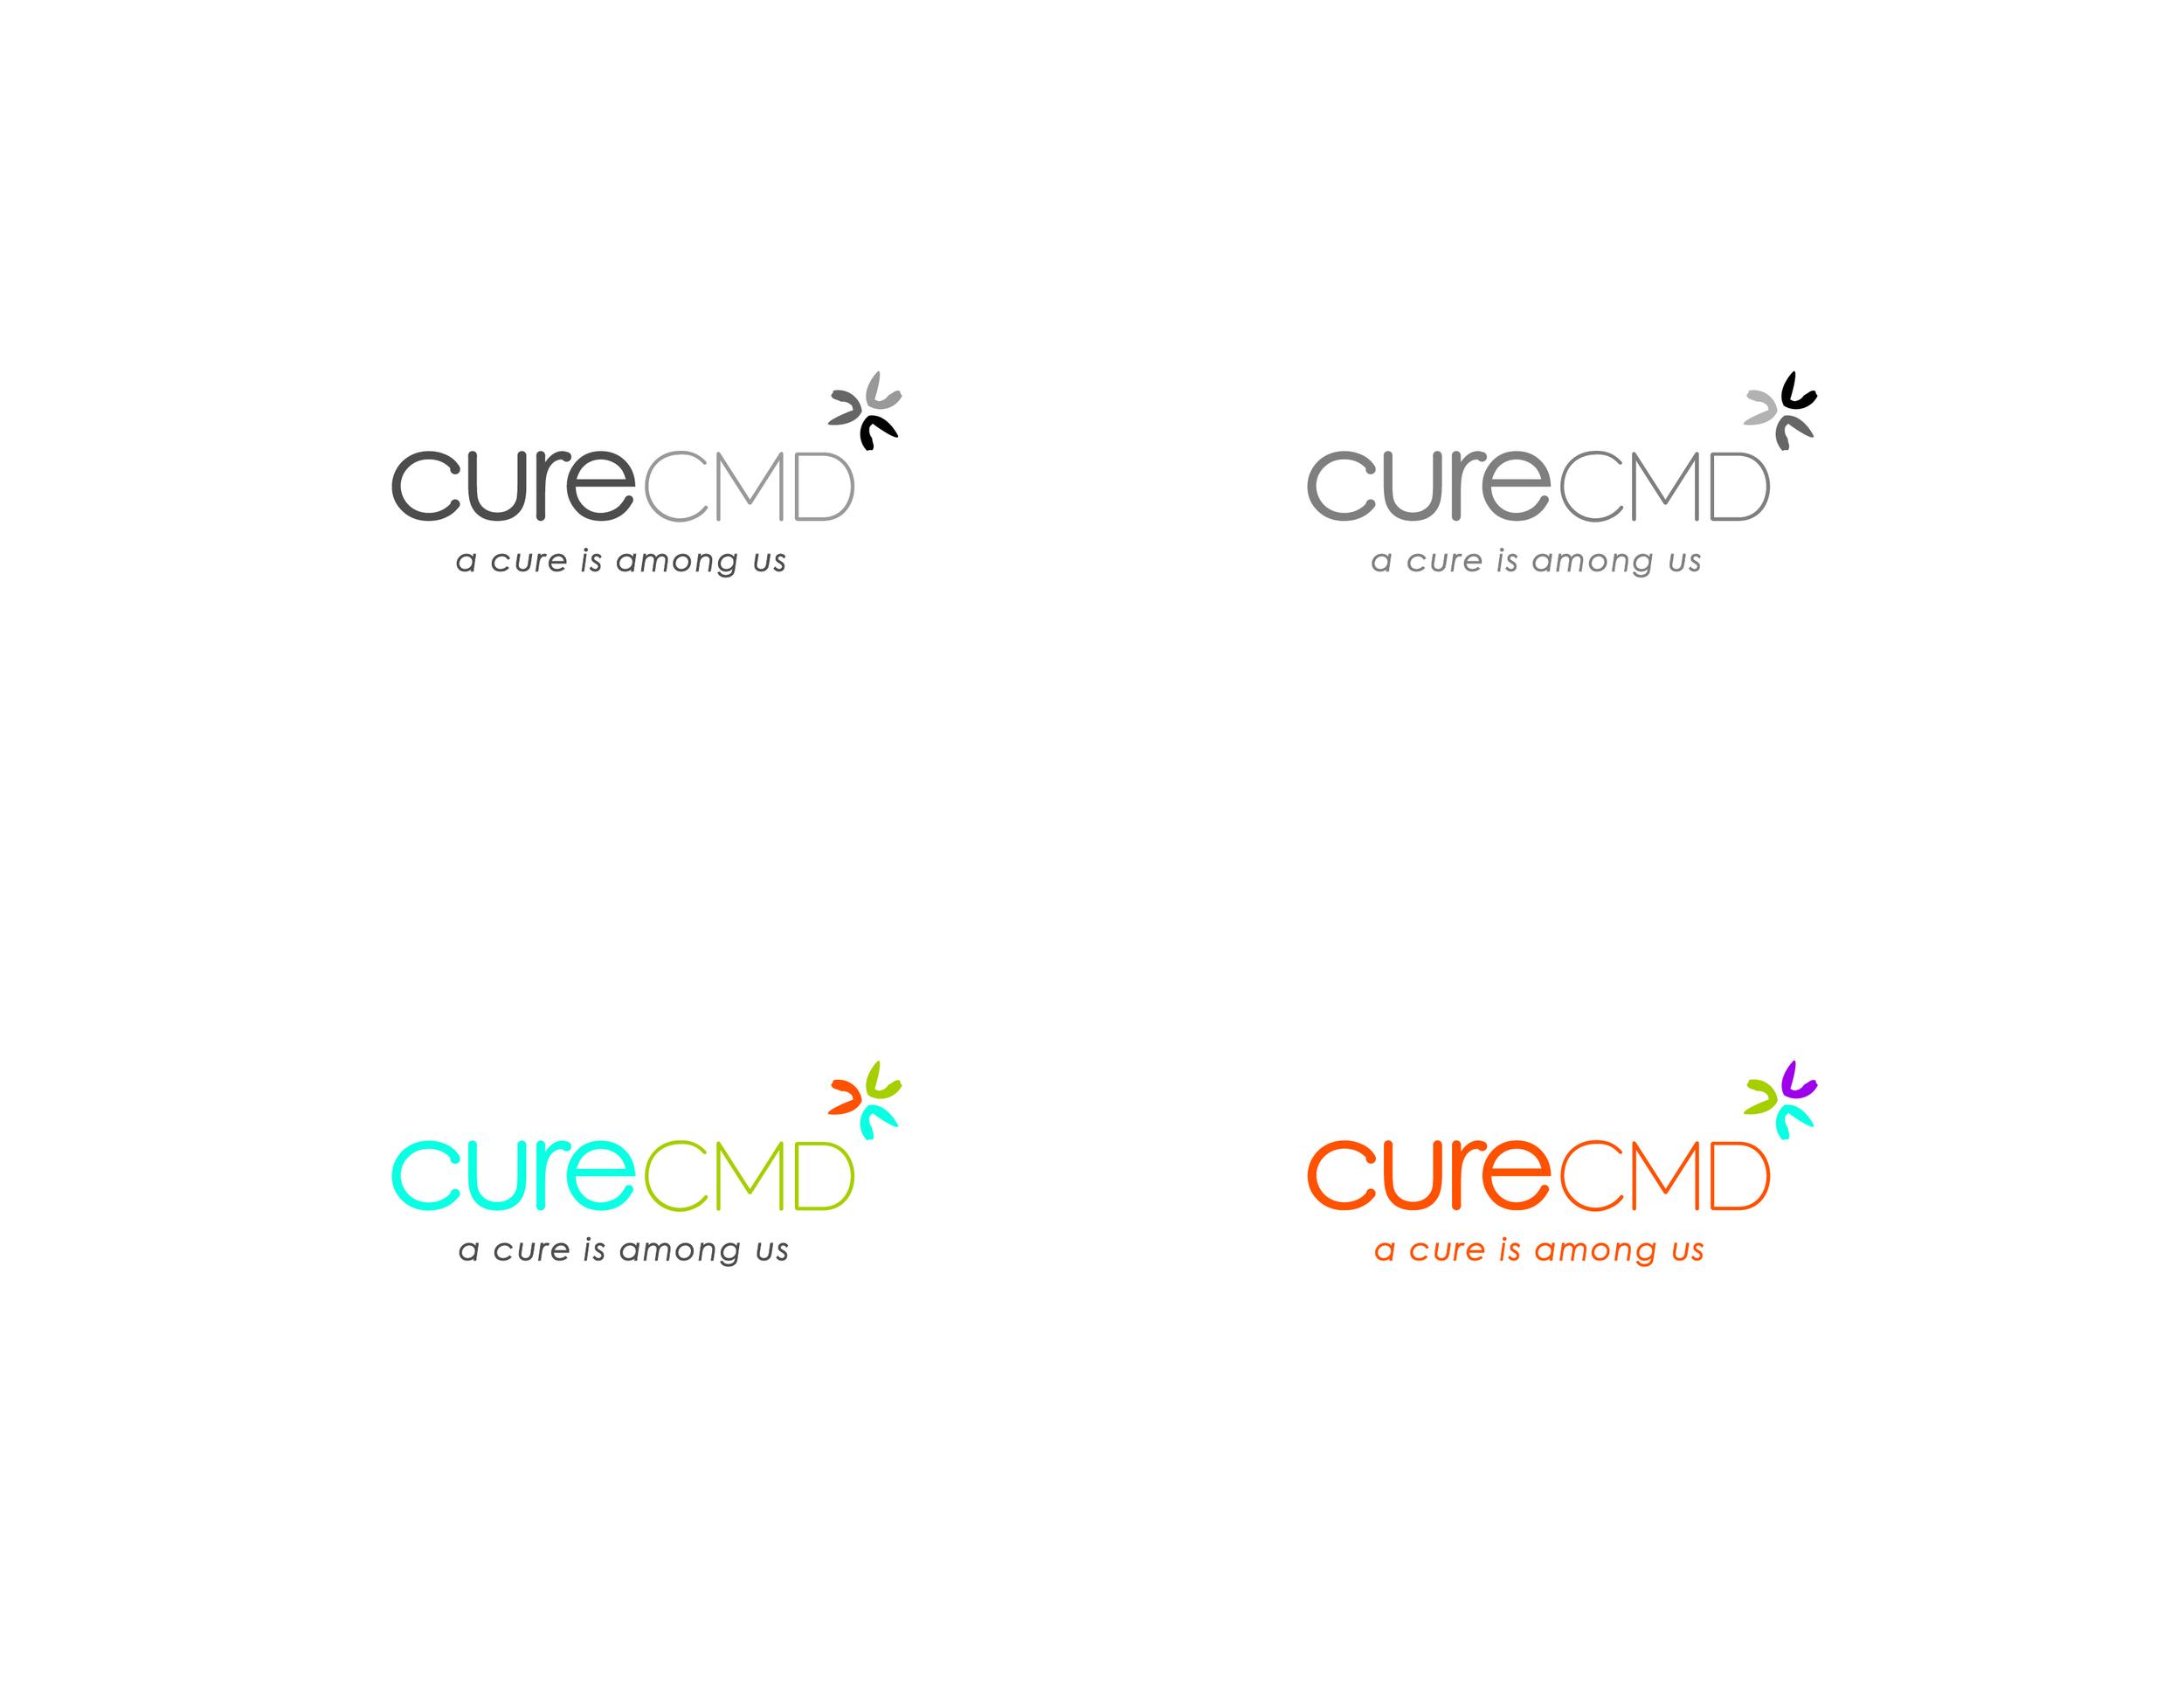 cure_CMD_logo_ideas-01.jpg